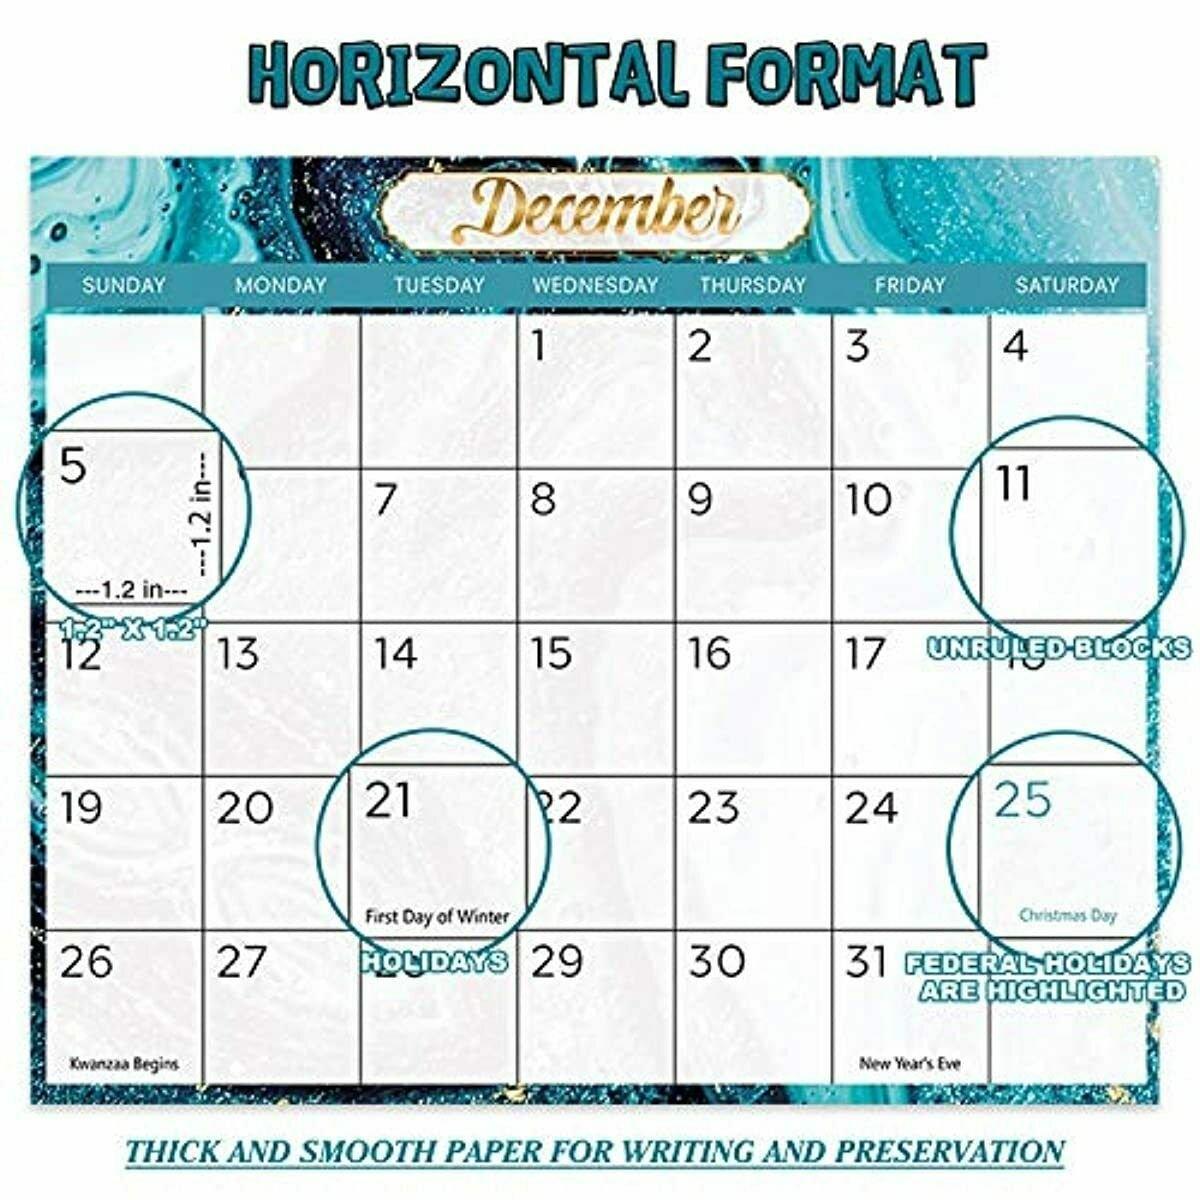 2021 Yearly Wall Calendar - 2021 Wall Calendar With Julian Date, From January To | Ebay inside Julian Date Calendar For Year 2021 Graphics